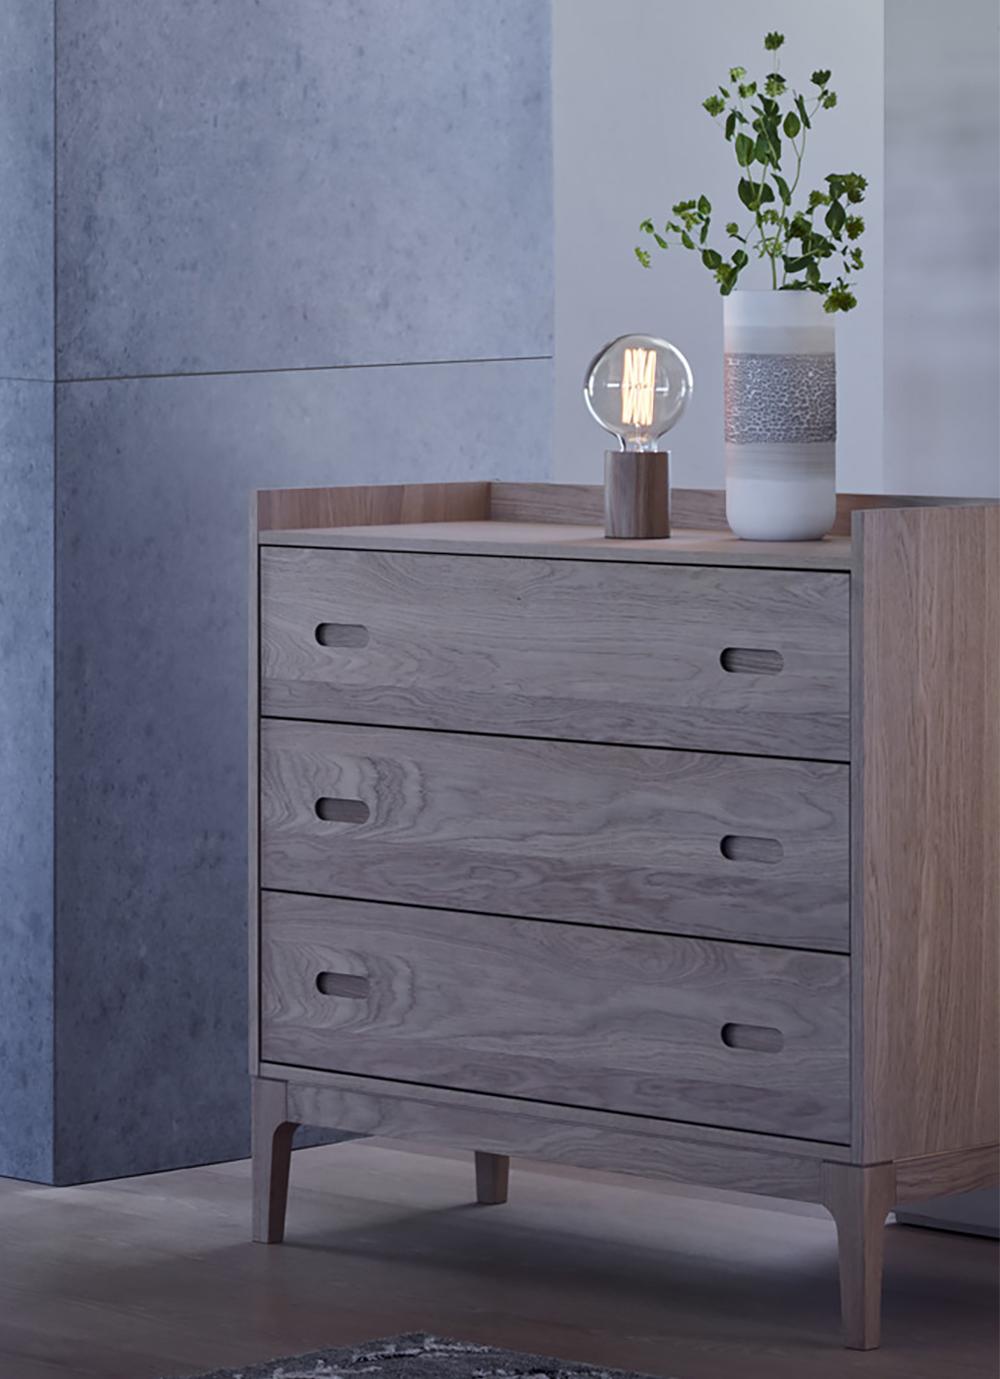 Japandi bedroom furniture